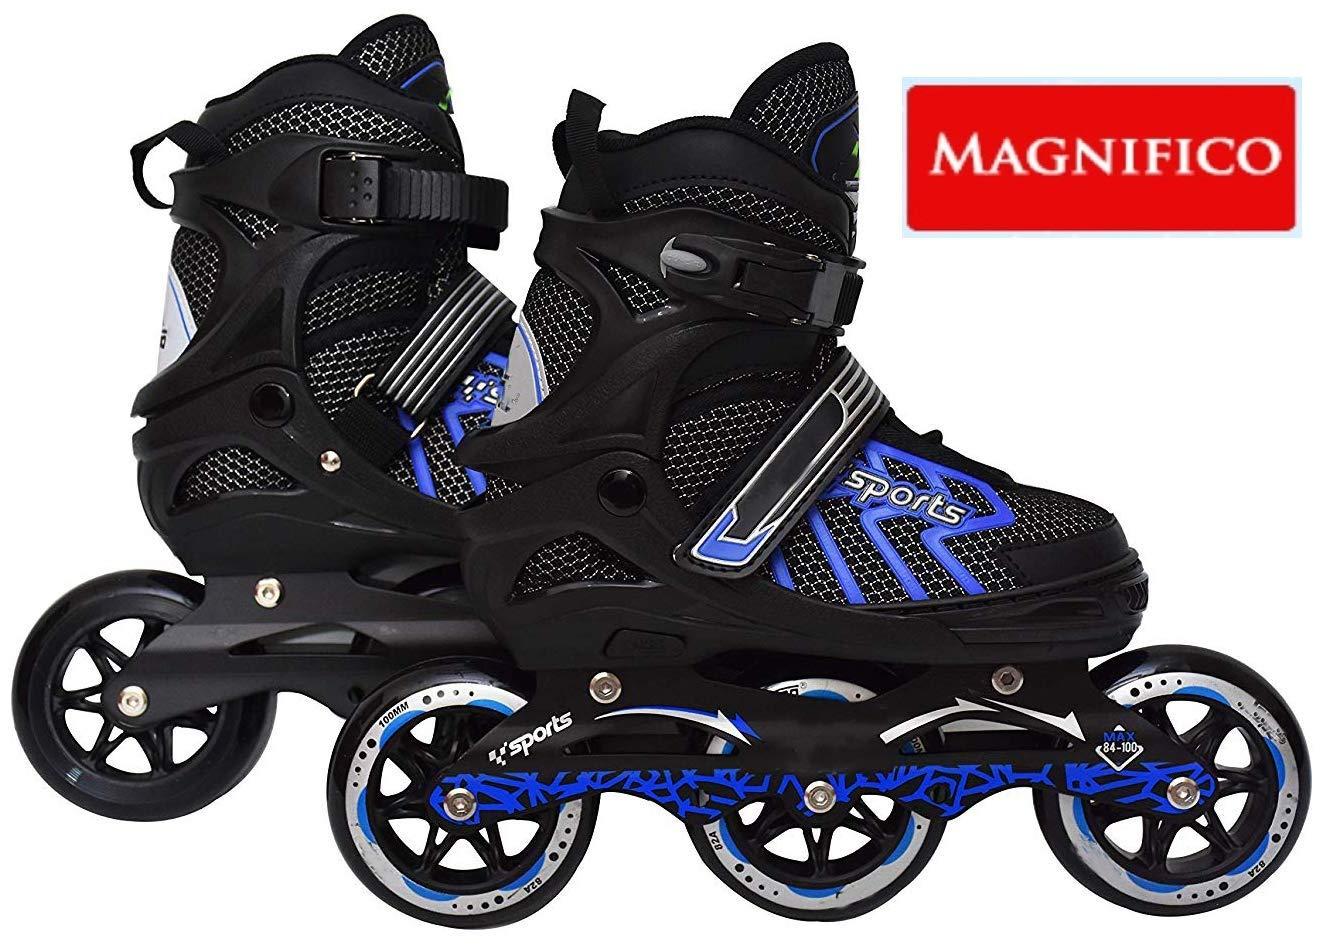 Buy MAGNIFICO 3 Wheel In-Line Skating